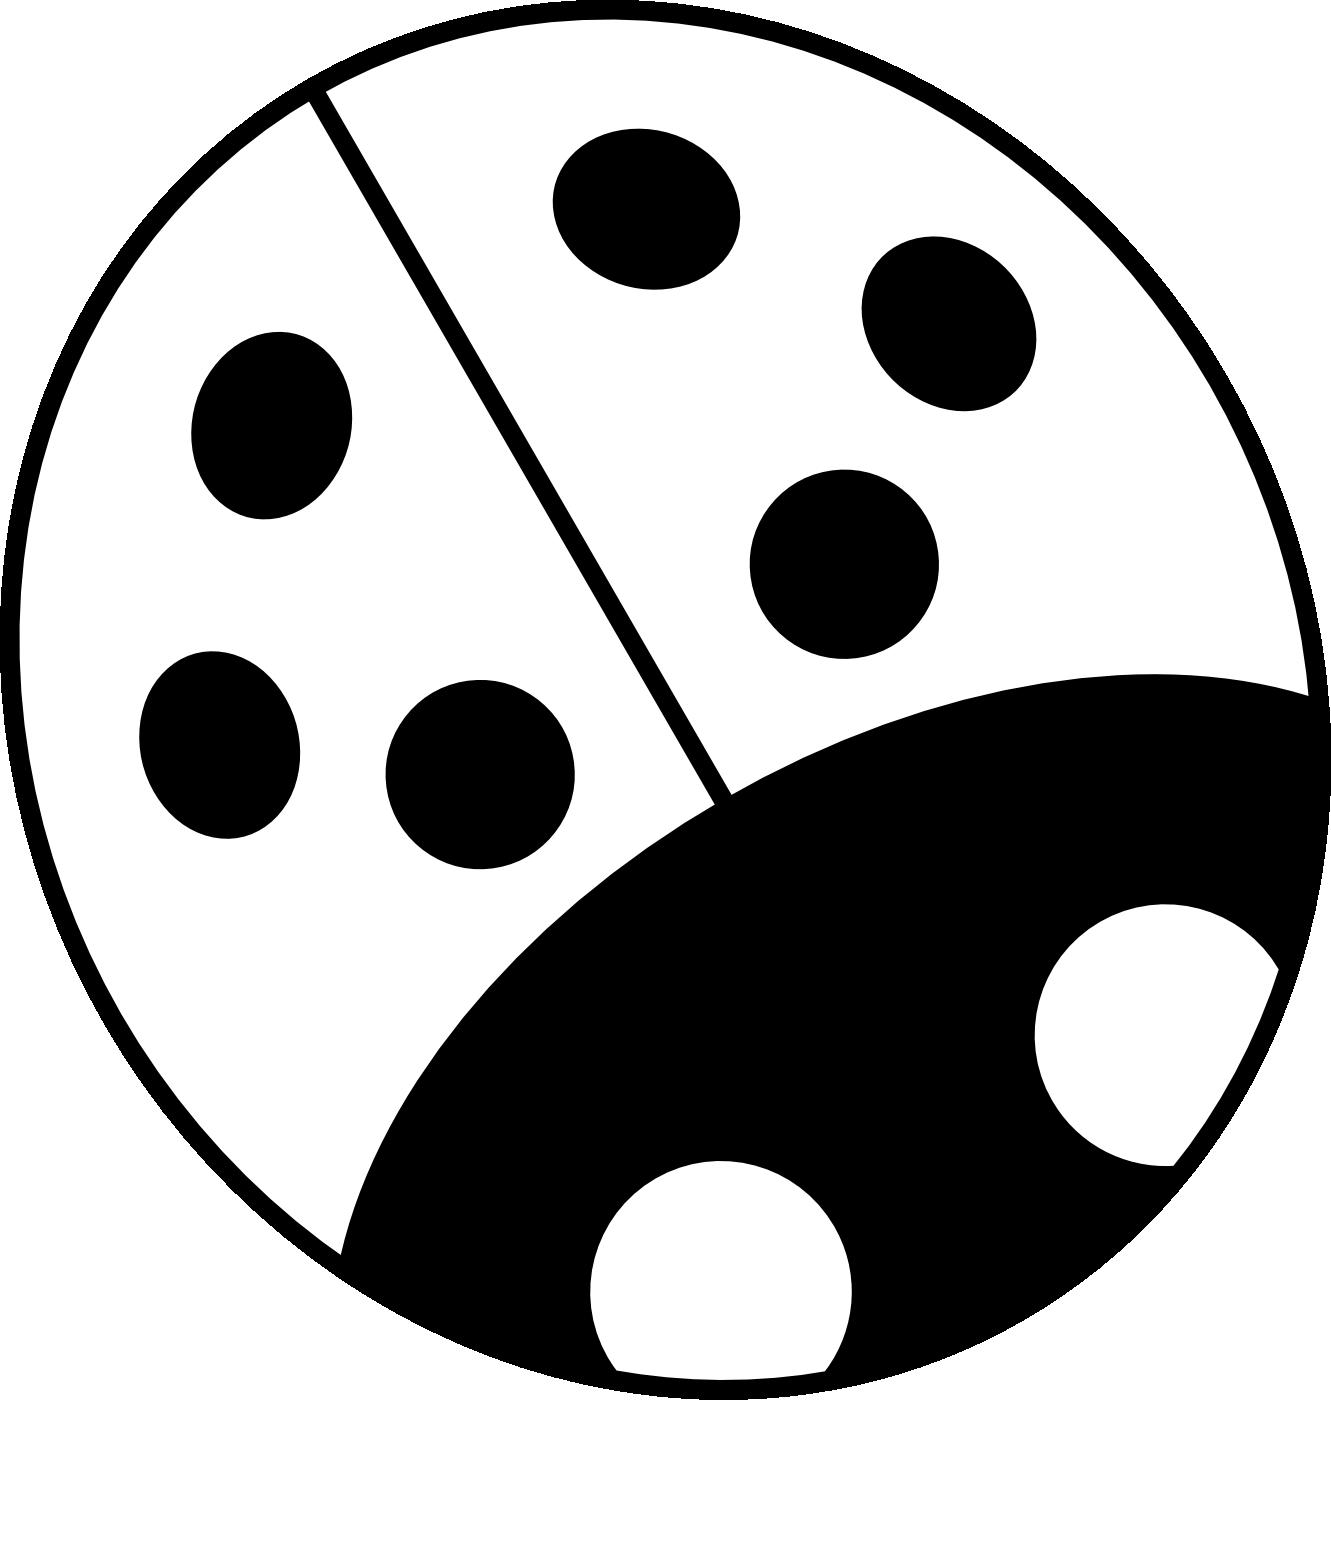 1331x1550 Ladybug Silhouette Clip Art